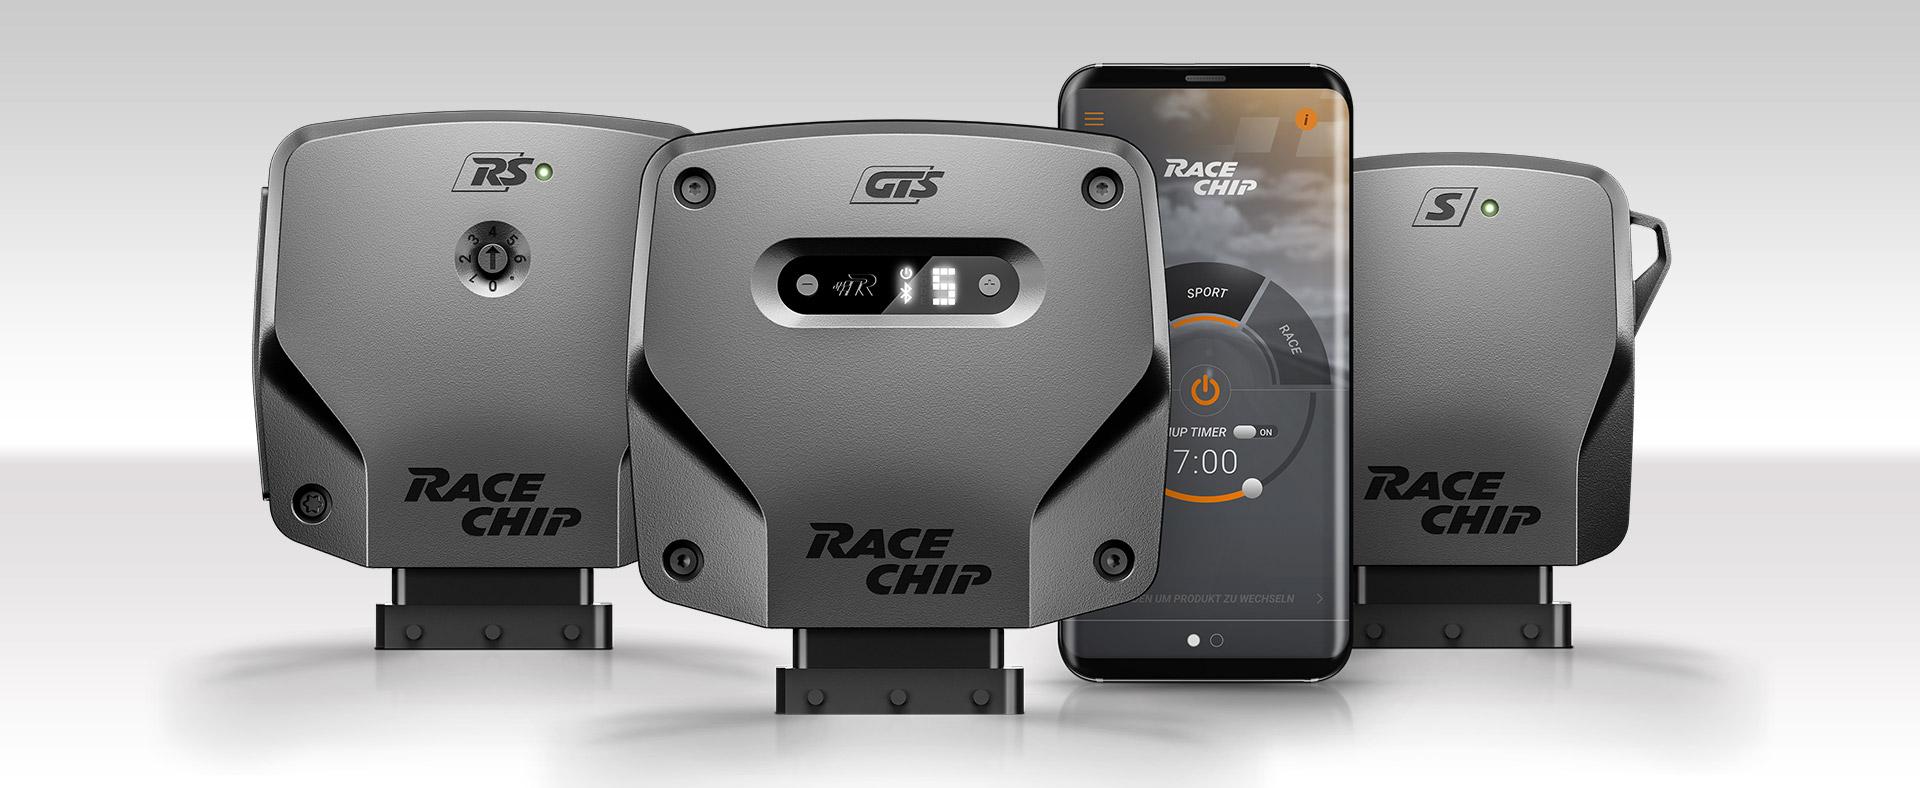 RaceChip presents brand new product line-up in Birmingham